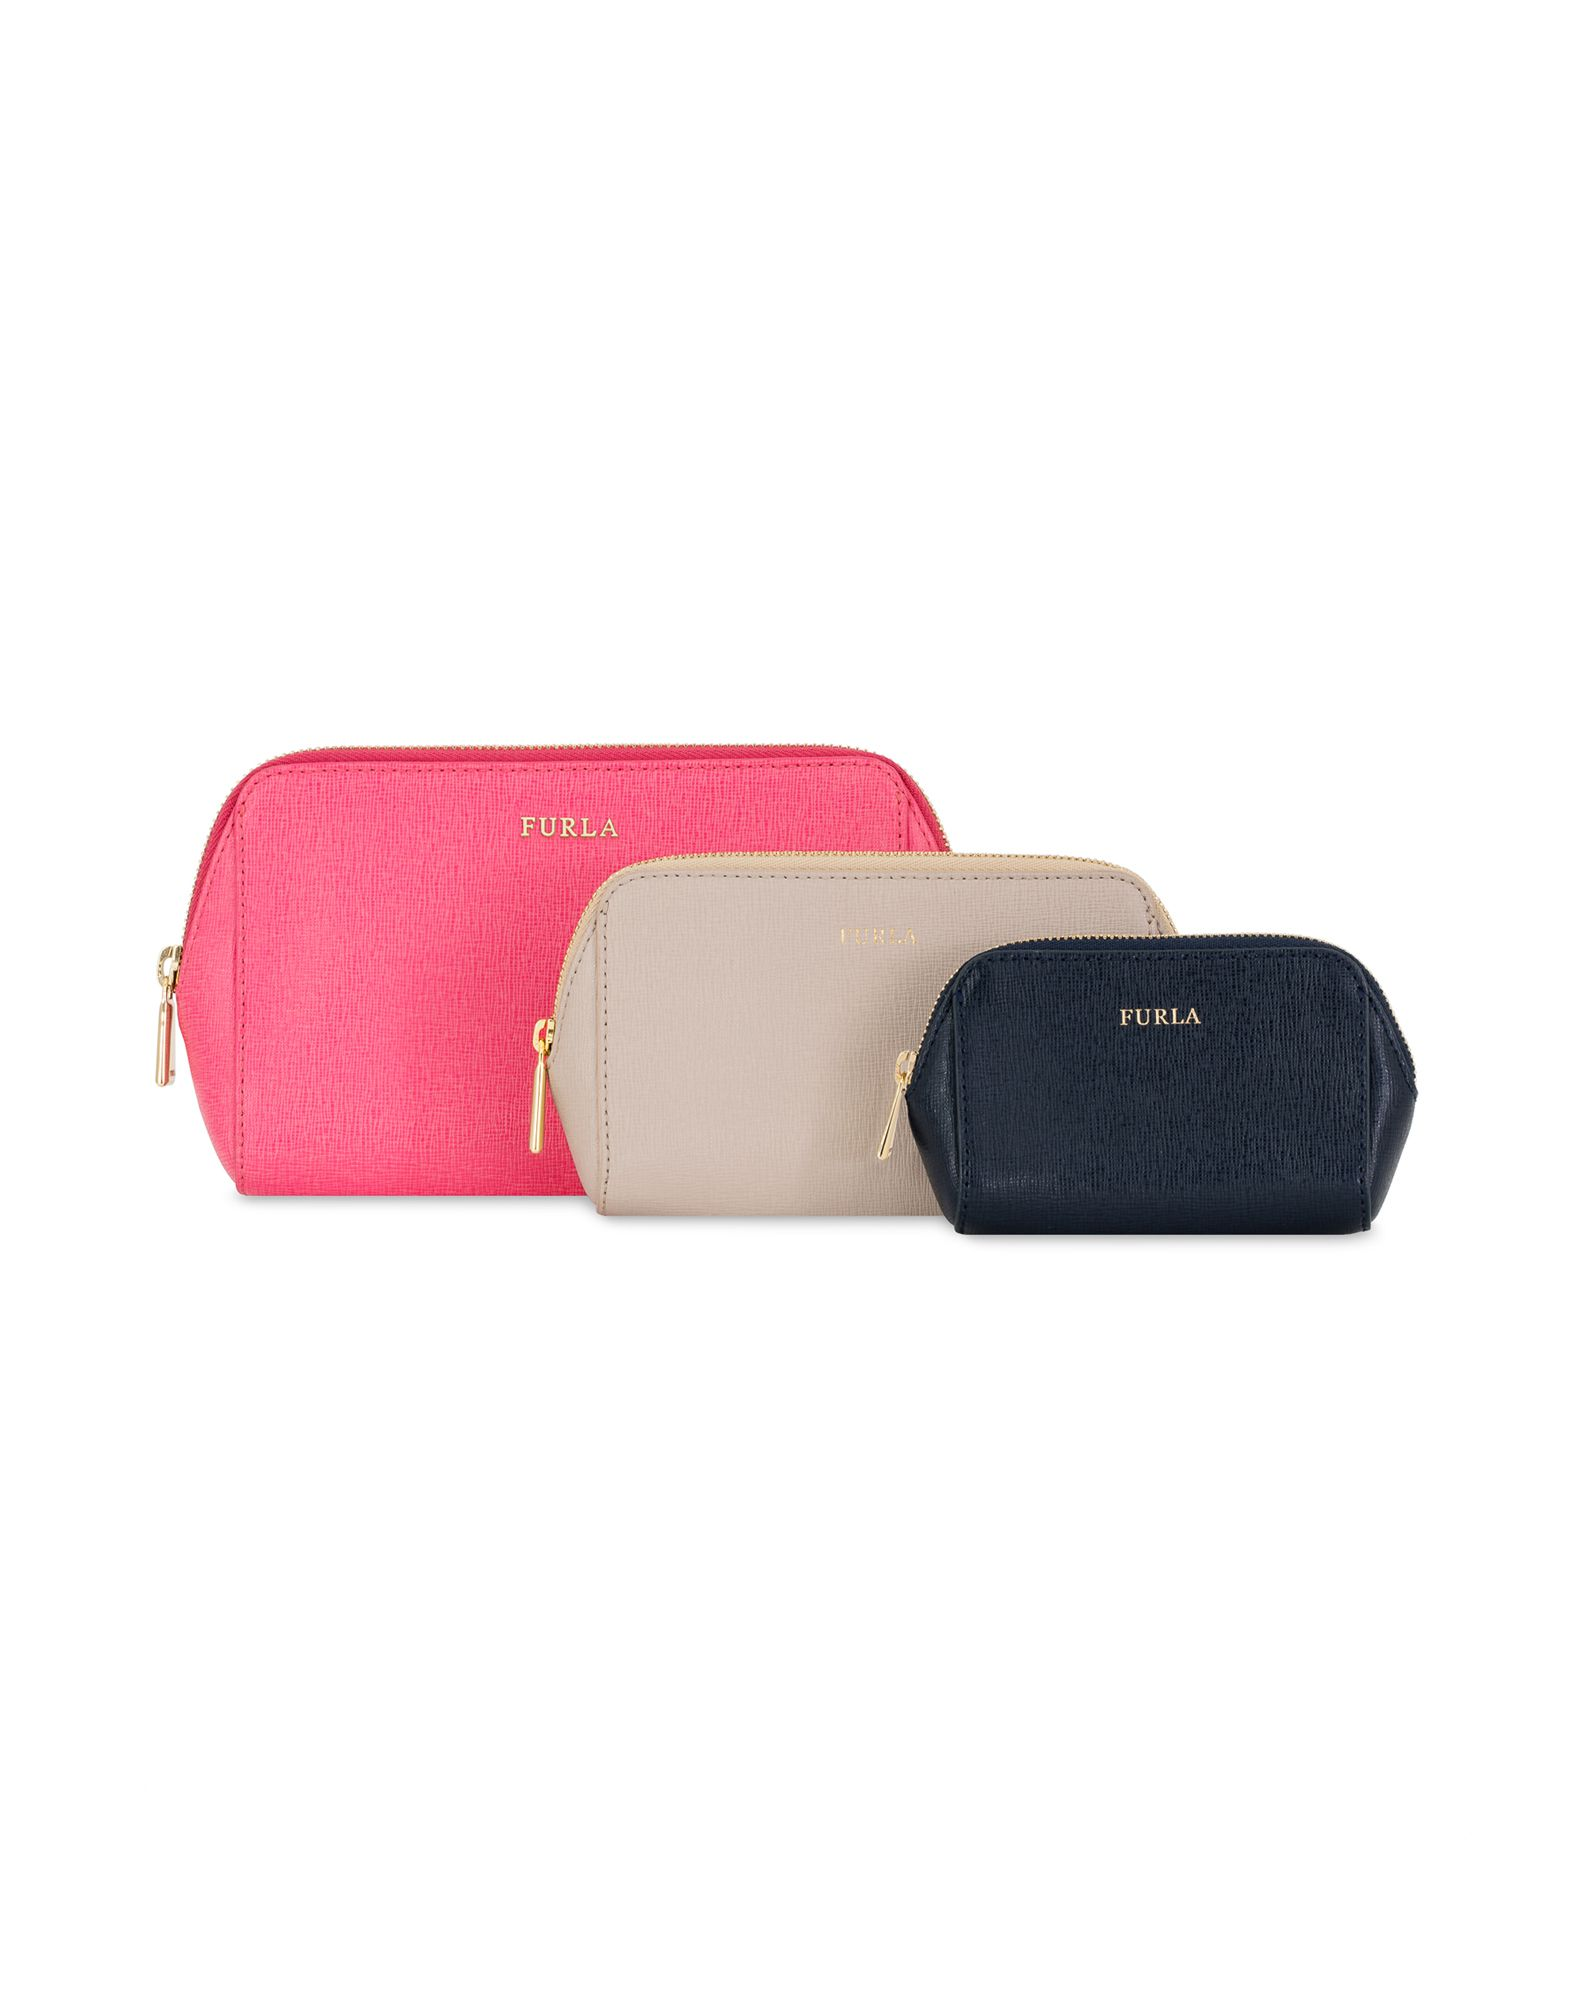 Bustina Furla Electra L Cosmetic Case Set - Donna - Acquista online su